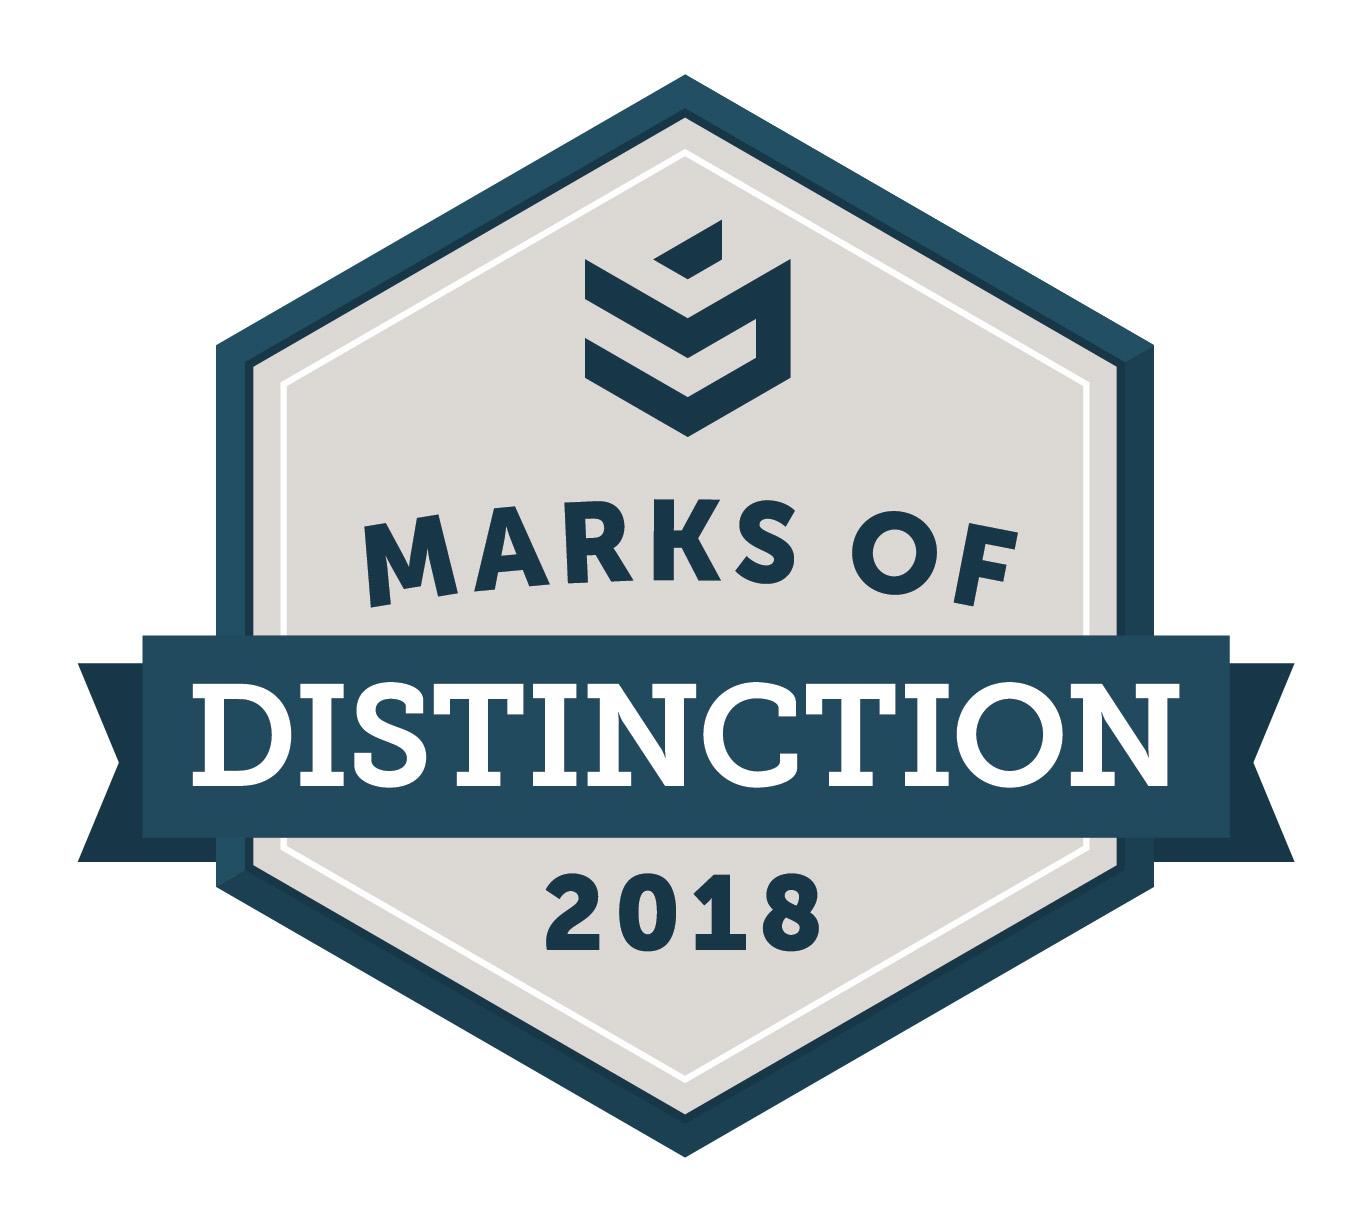 Marks of Distinction 2018